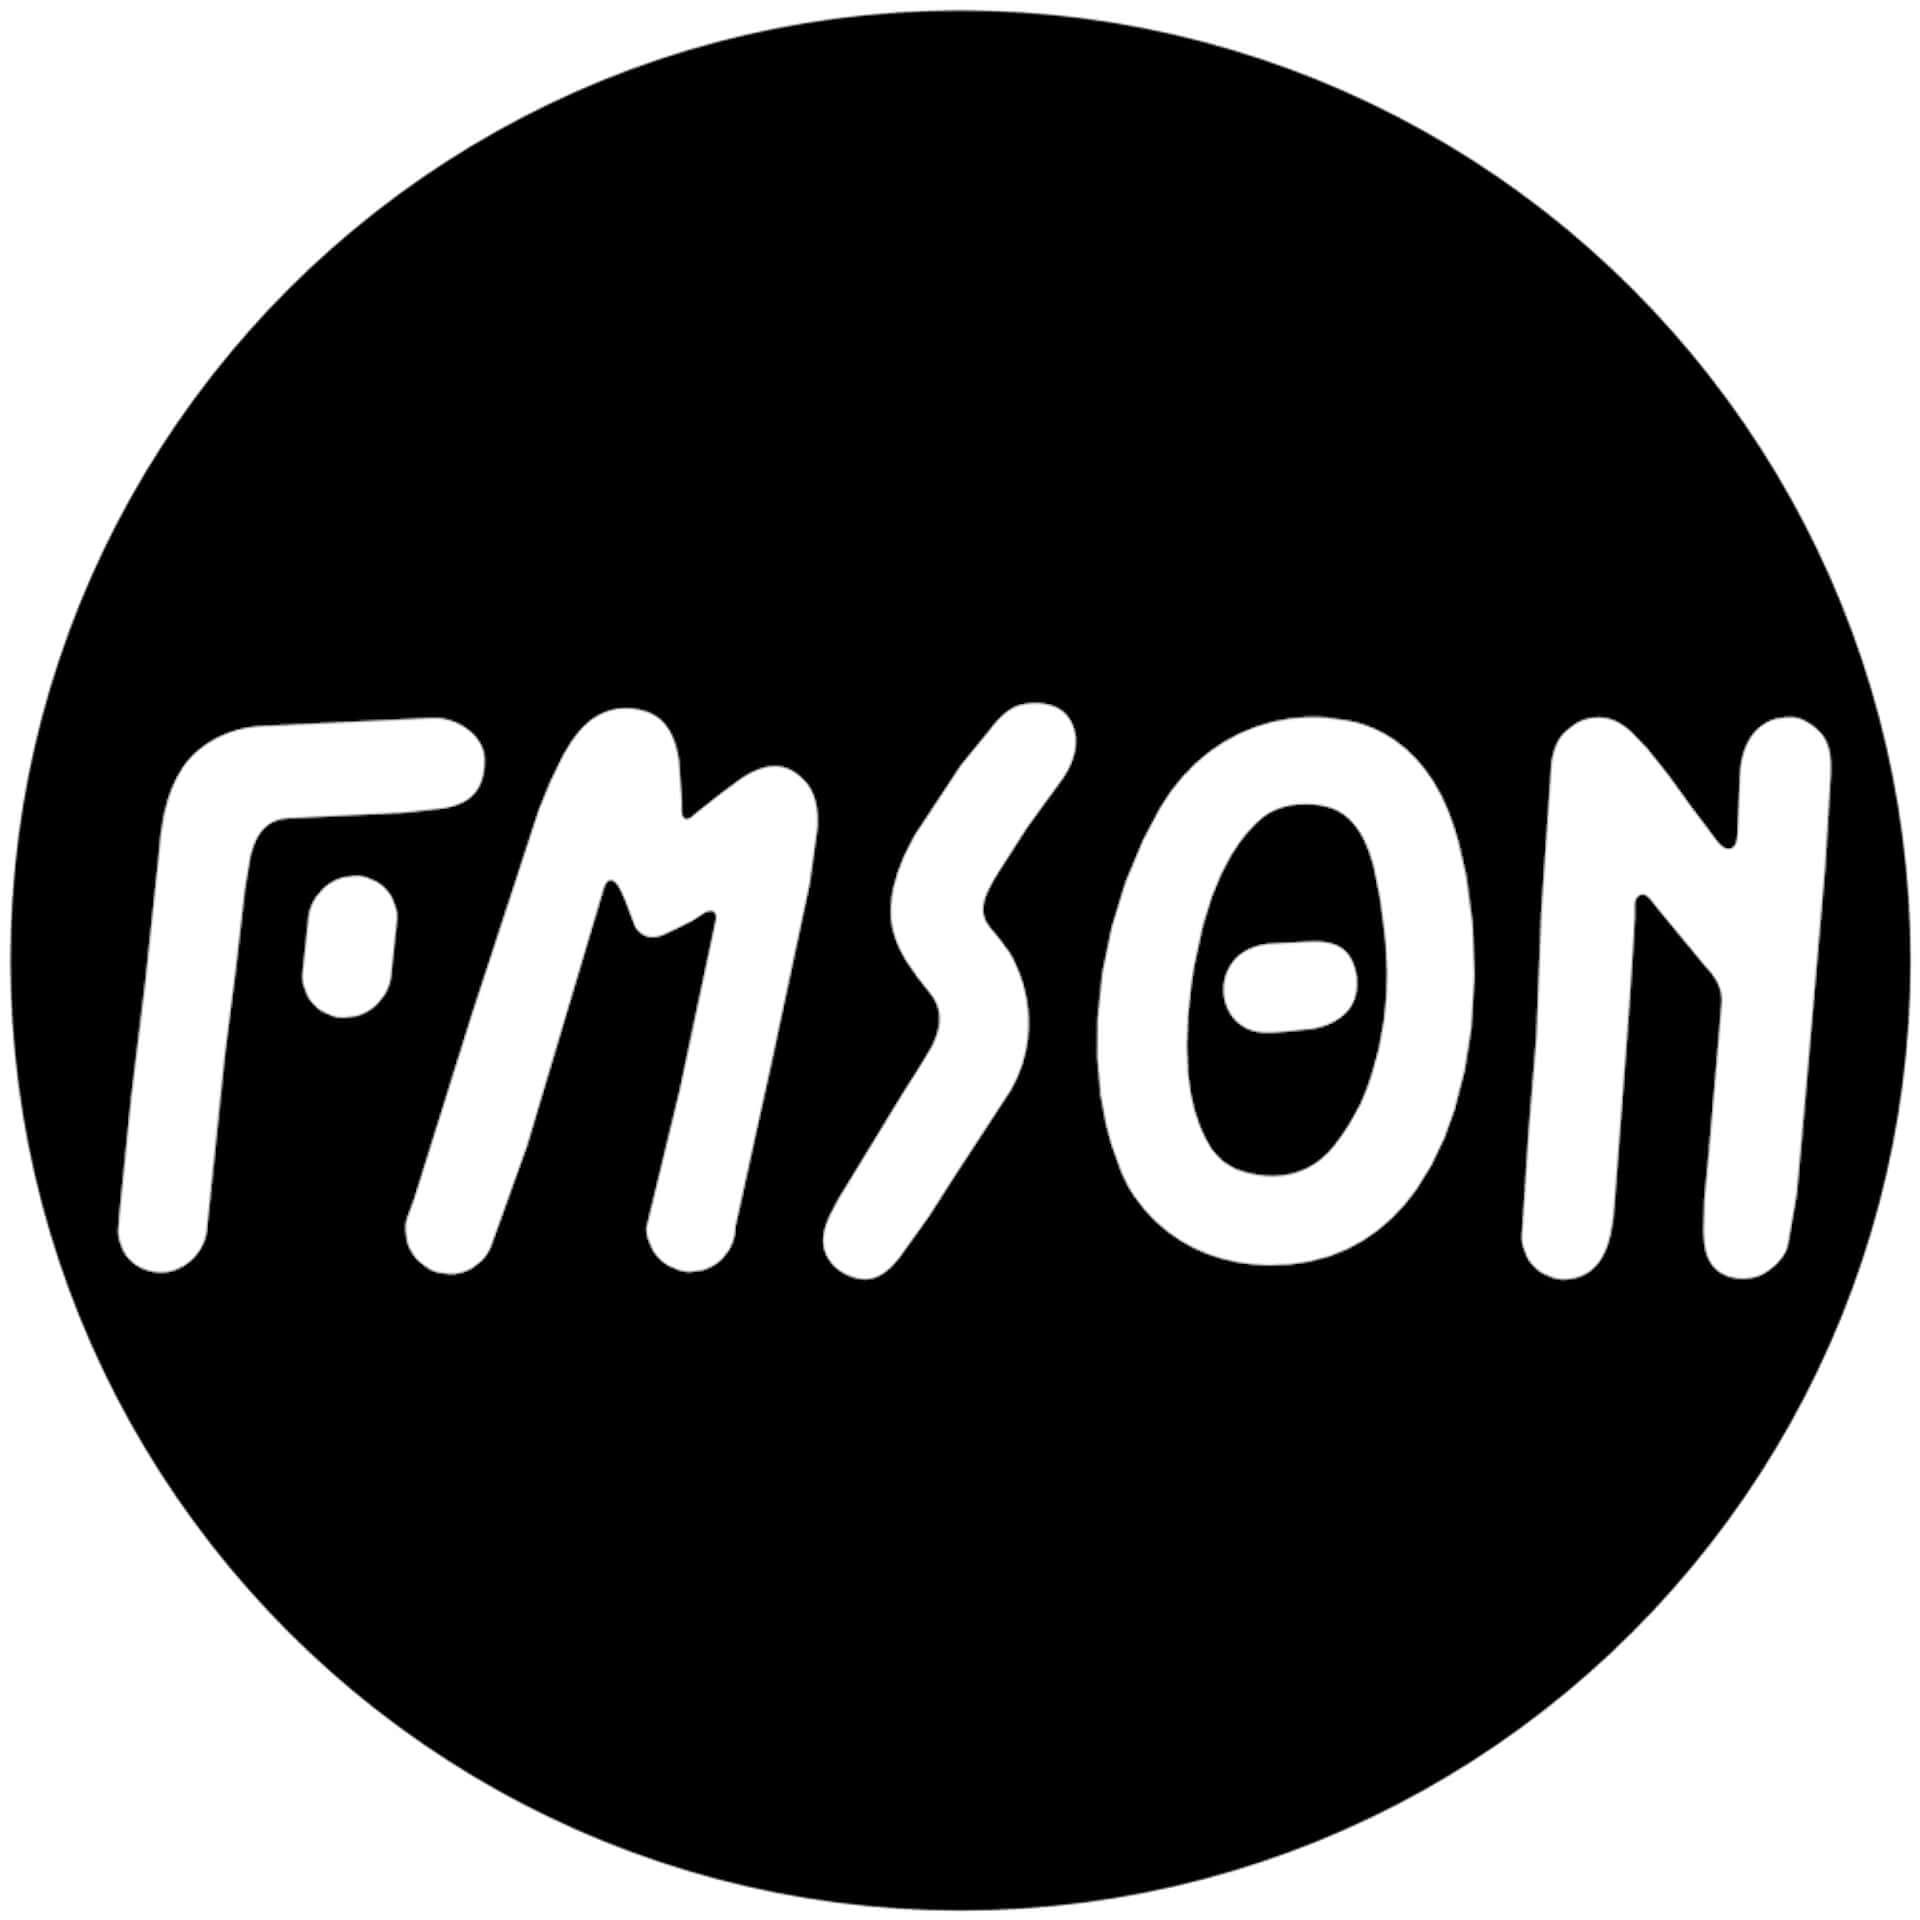 CEKAIの24時間DJ配信局『FM SON』に長場雄、安田昂弘、Masayoshi Iimori、OWNCEANらが新たに参加! musci200522_cekai_fmson_2-1920x1920